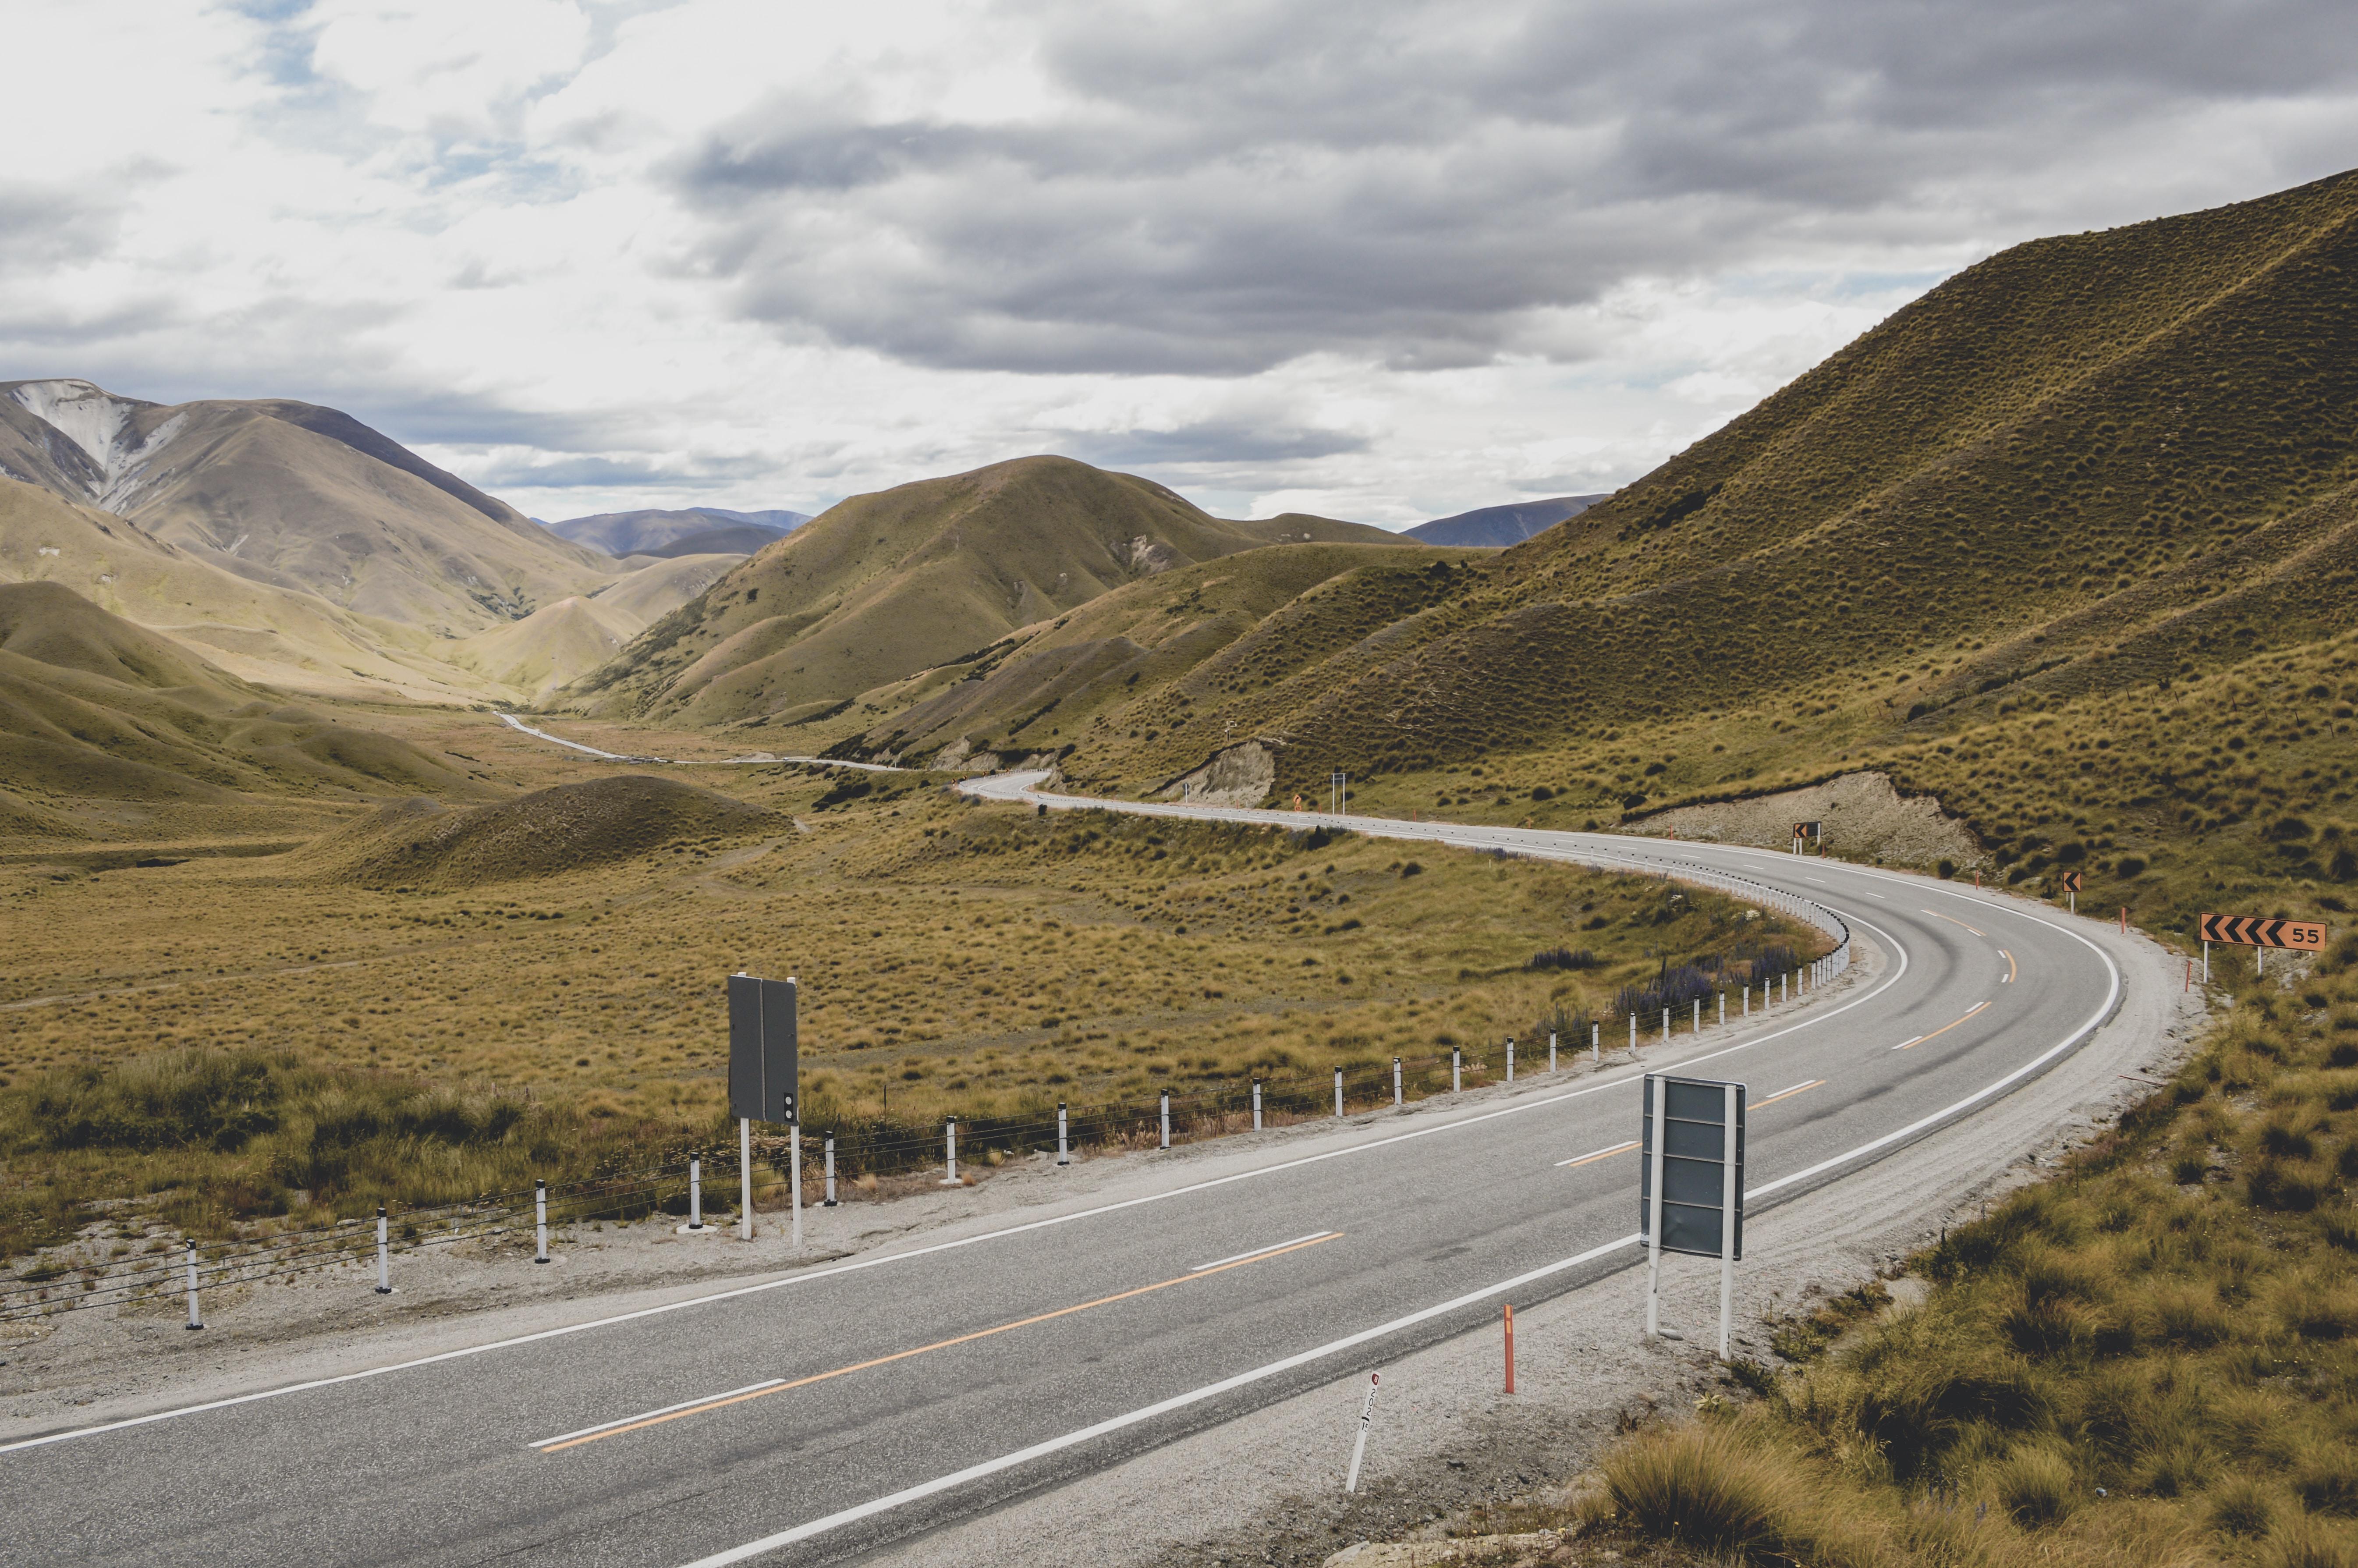 asphalt road between mountain